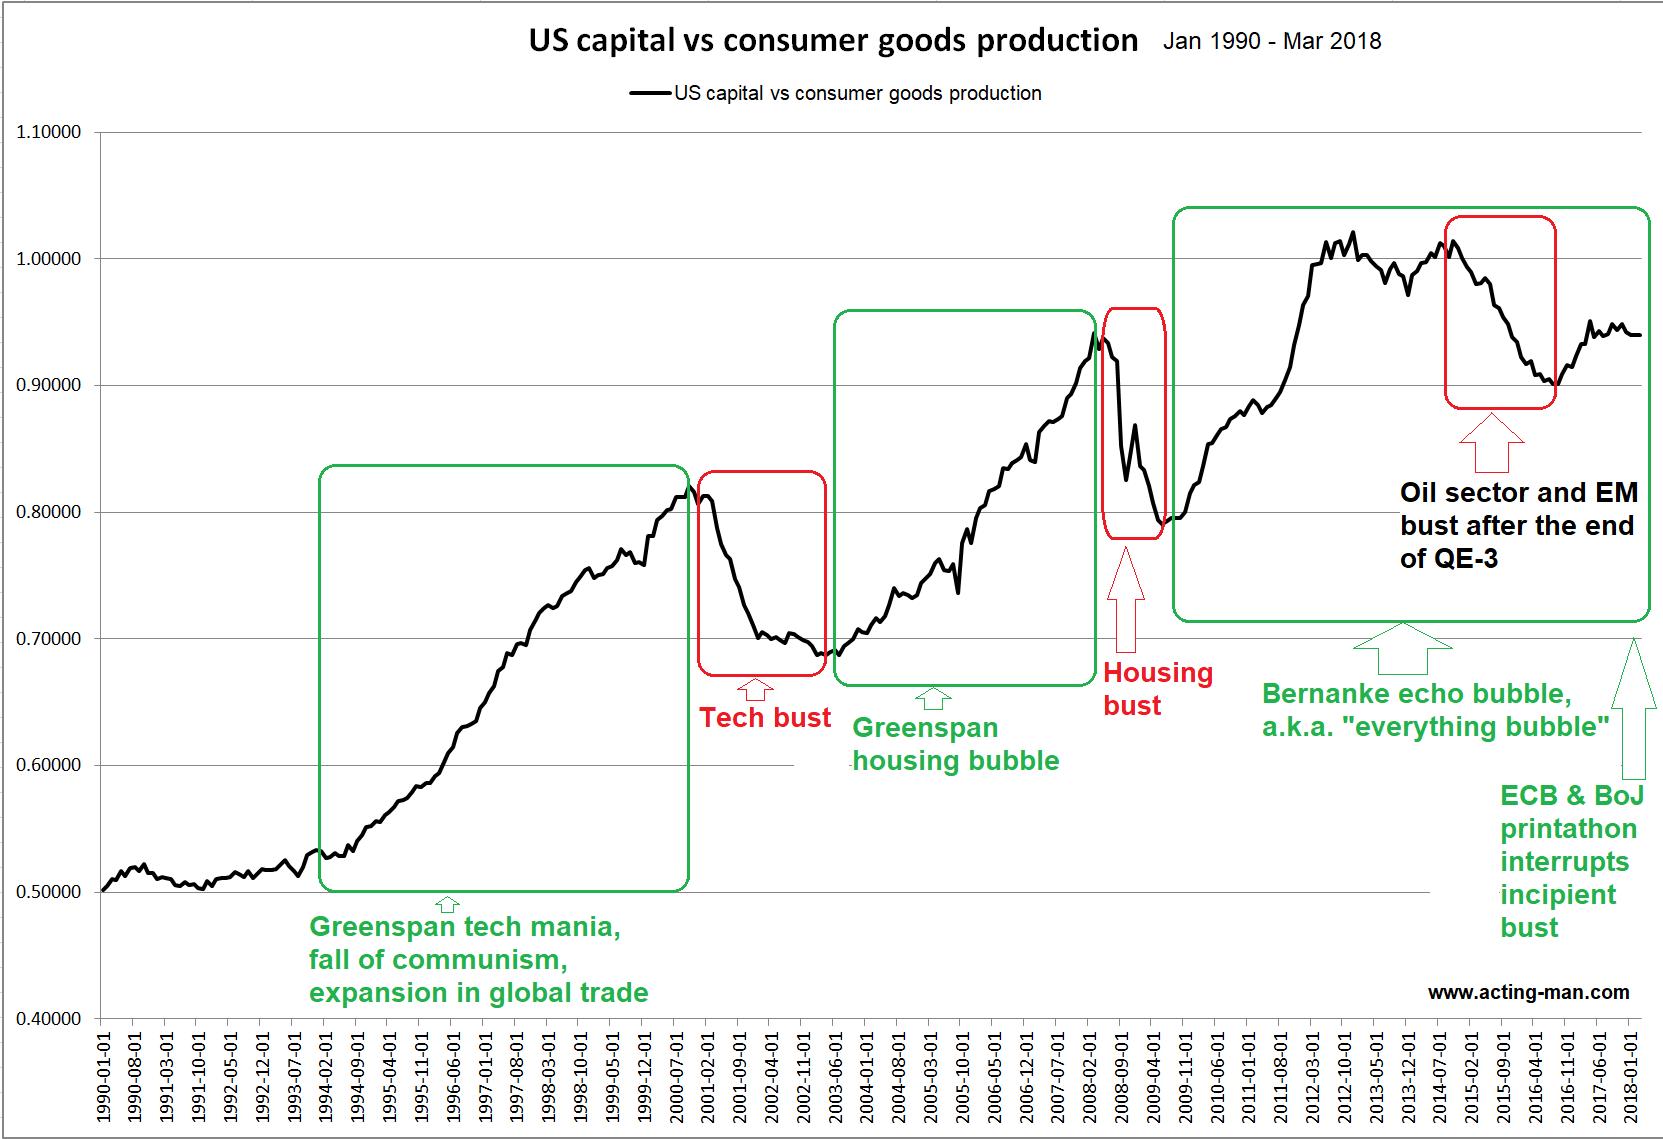 US Capital vs Consumer Goods Production, Jan 1990 - Mar 2018